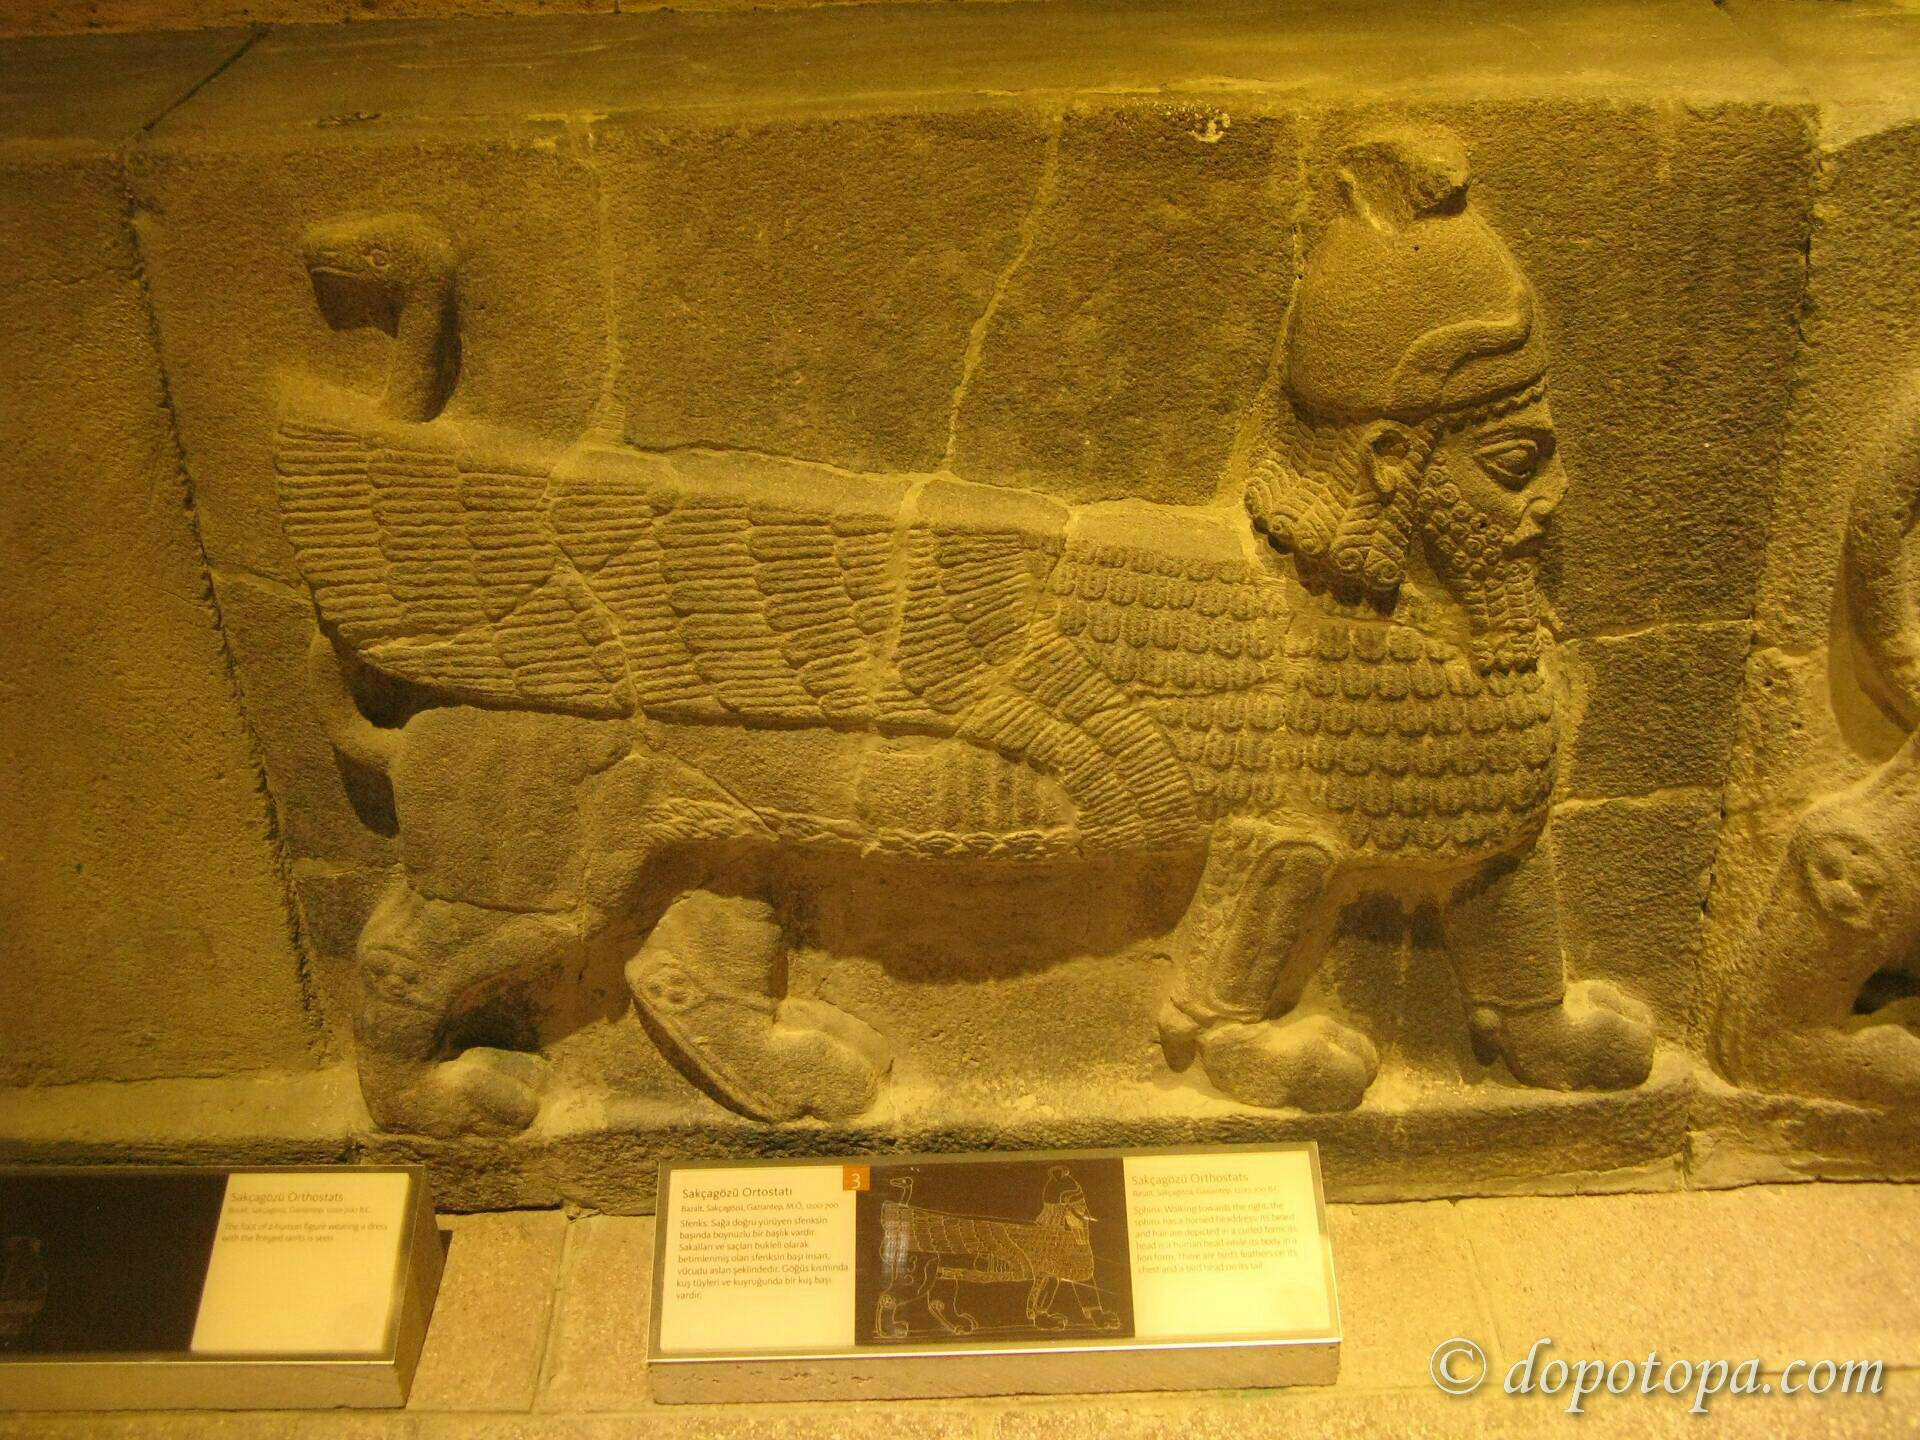 ankara_museum_stone_artefacts_25_1.JPG